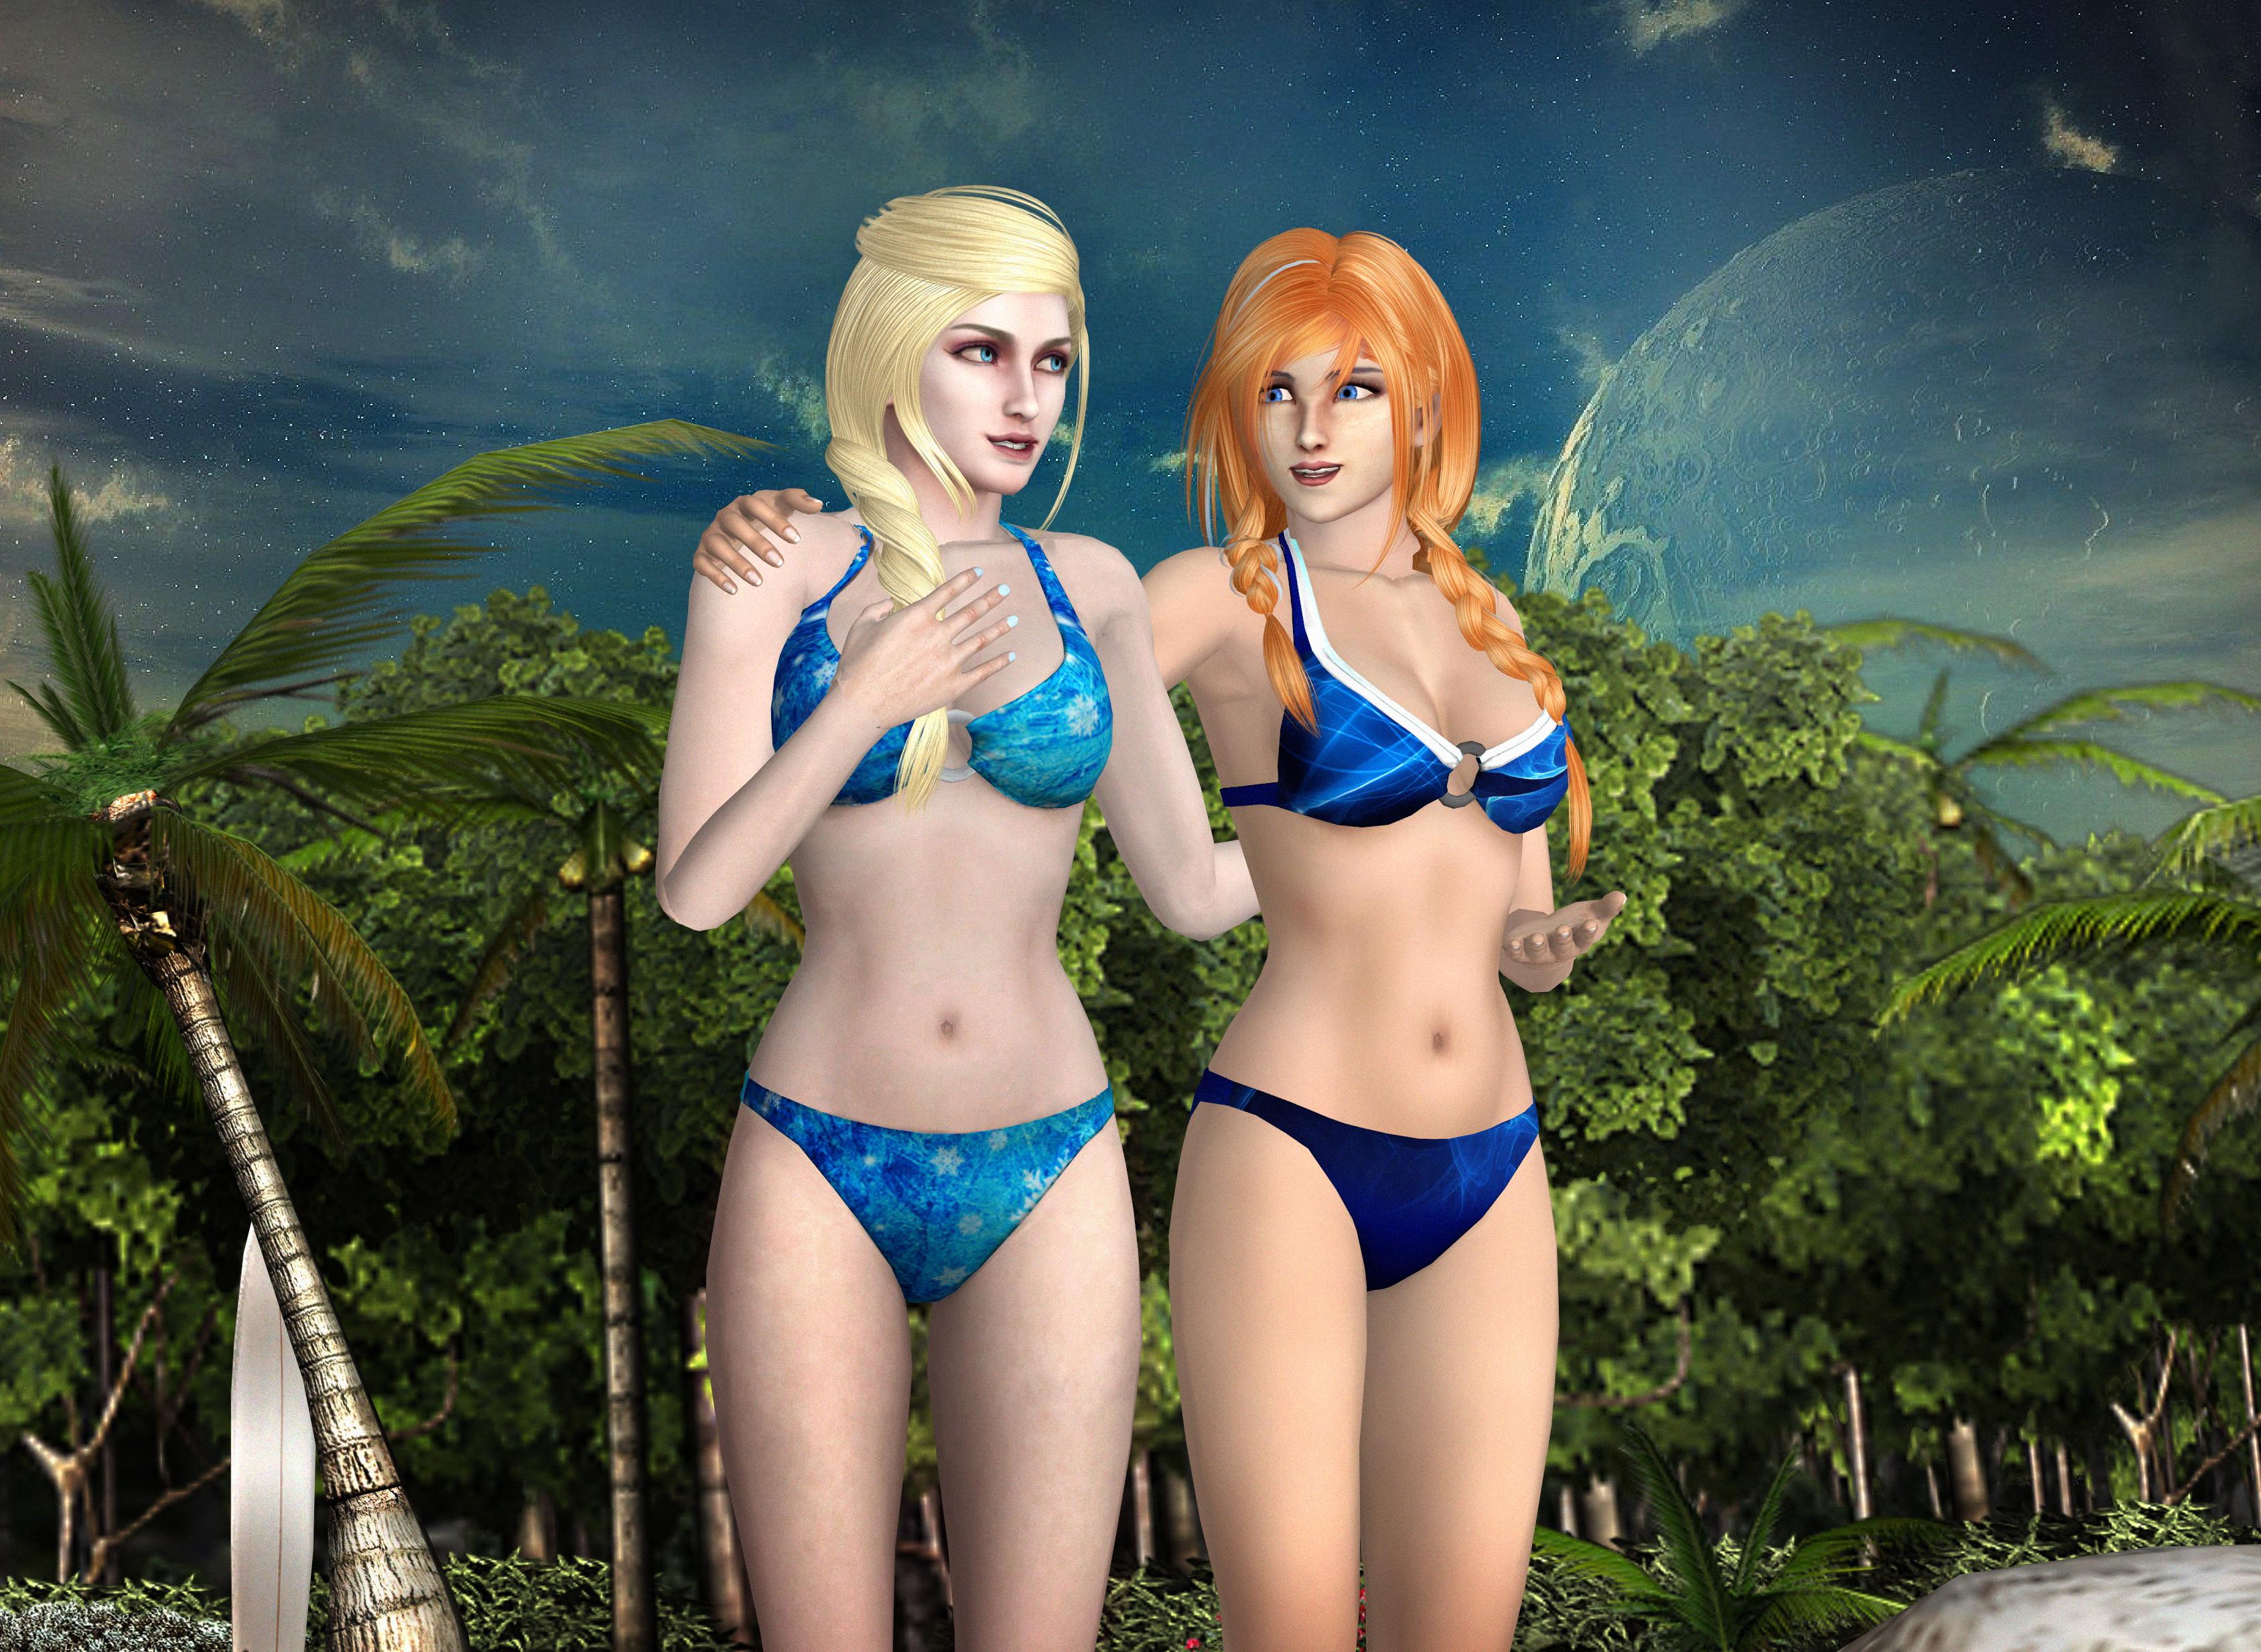 XNA: Frozen - Elsa and Anna Bikini Download by SovietMentality